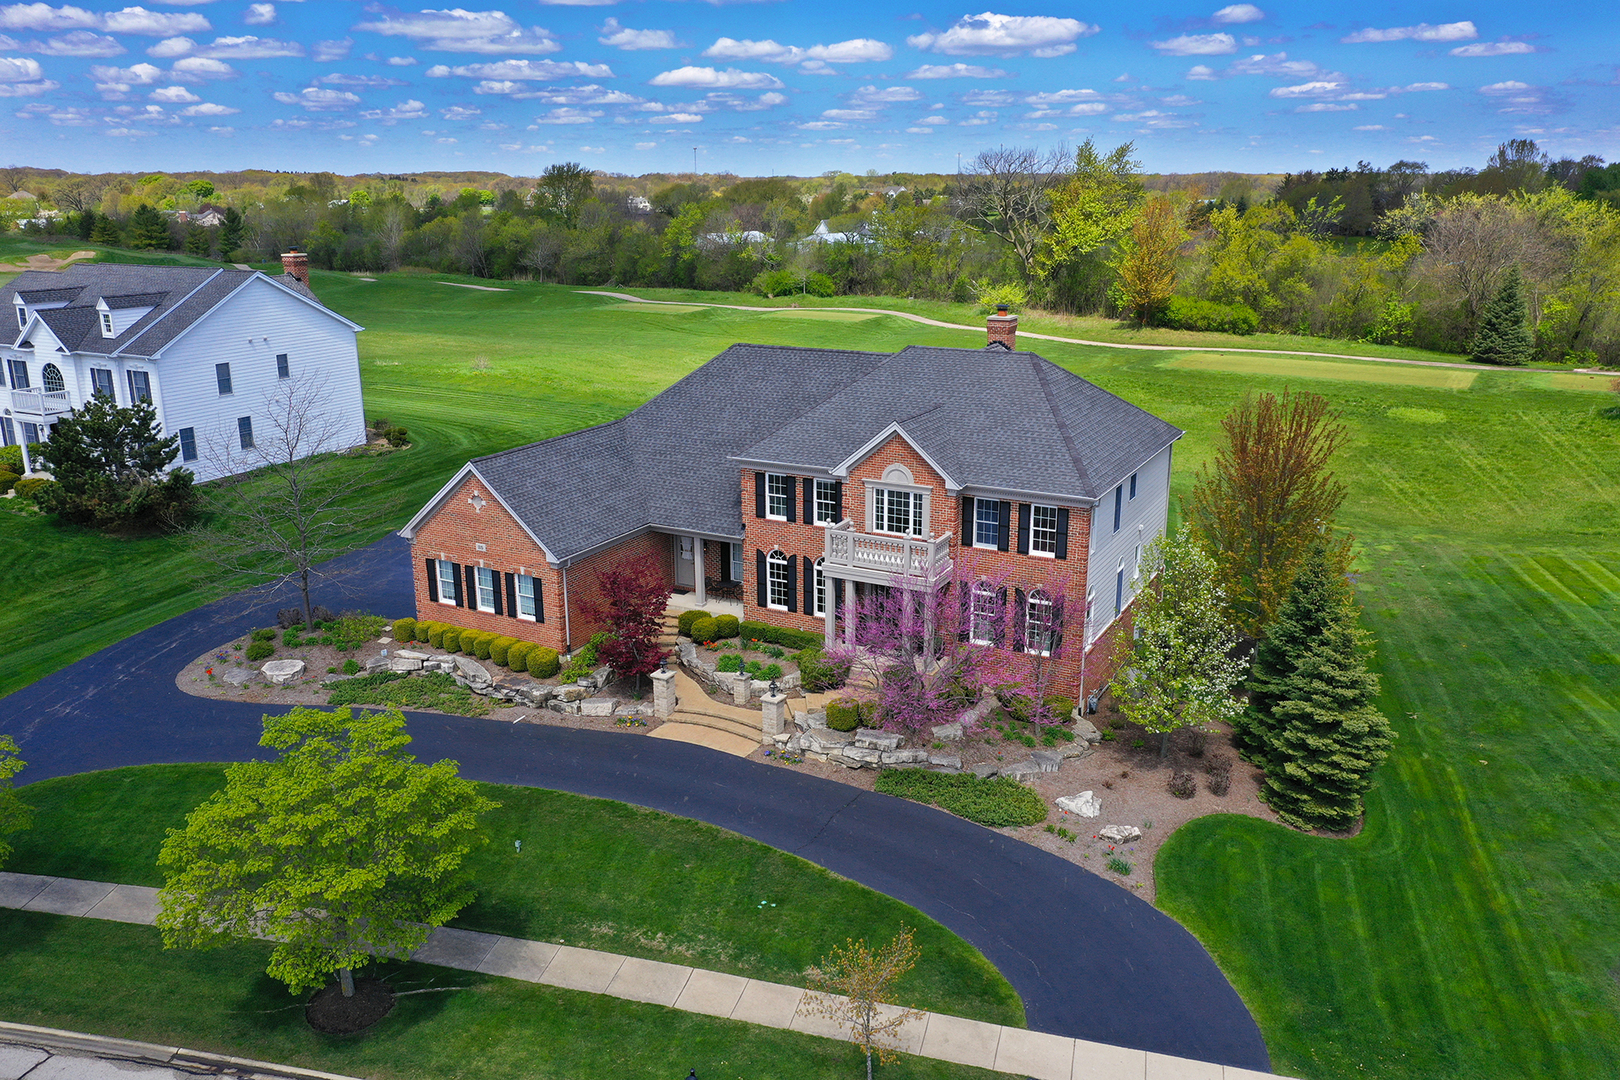 25 Tournament Drive, Hawthorn Woods, Illinois 60047